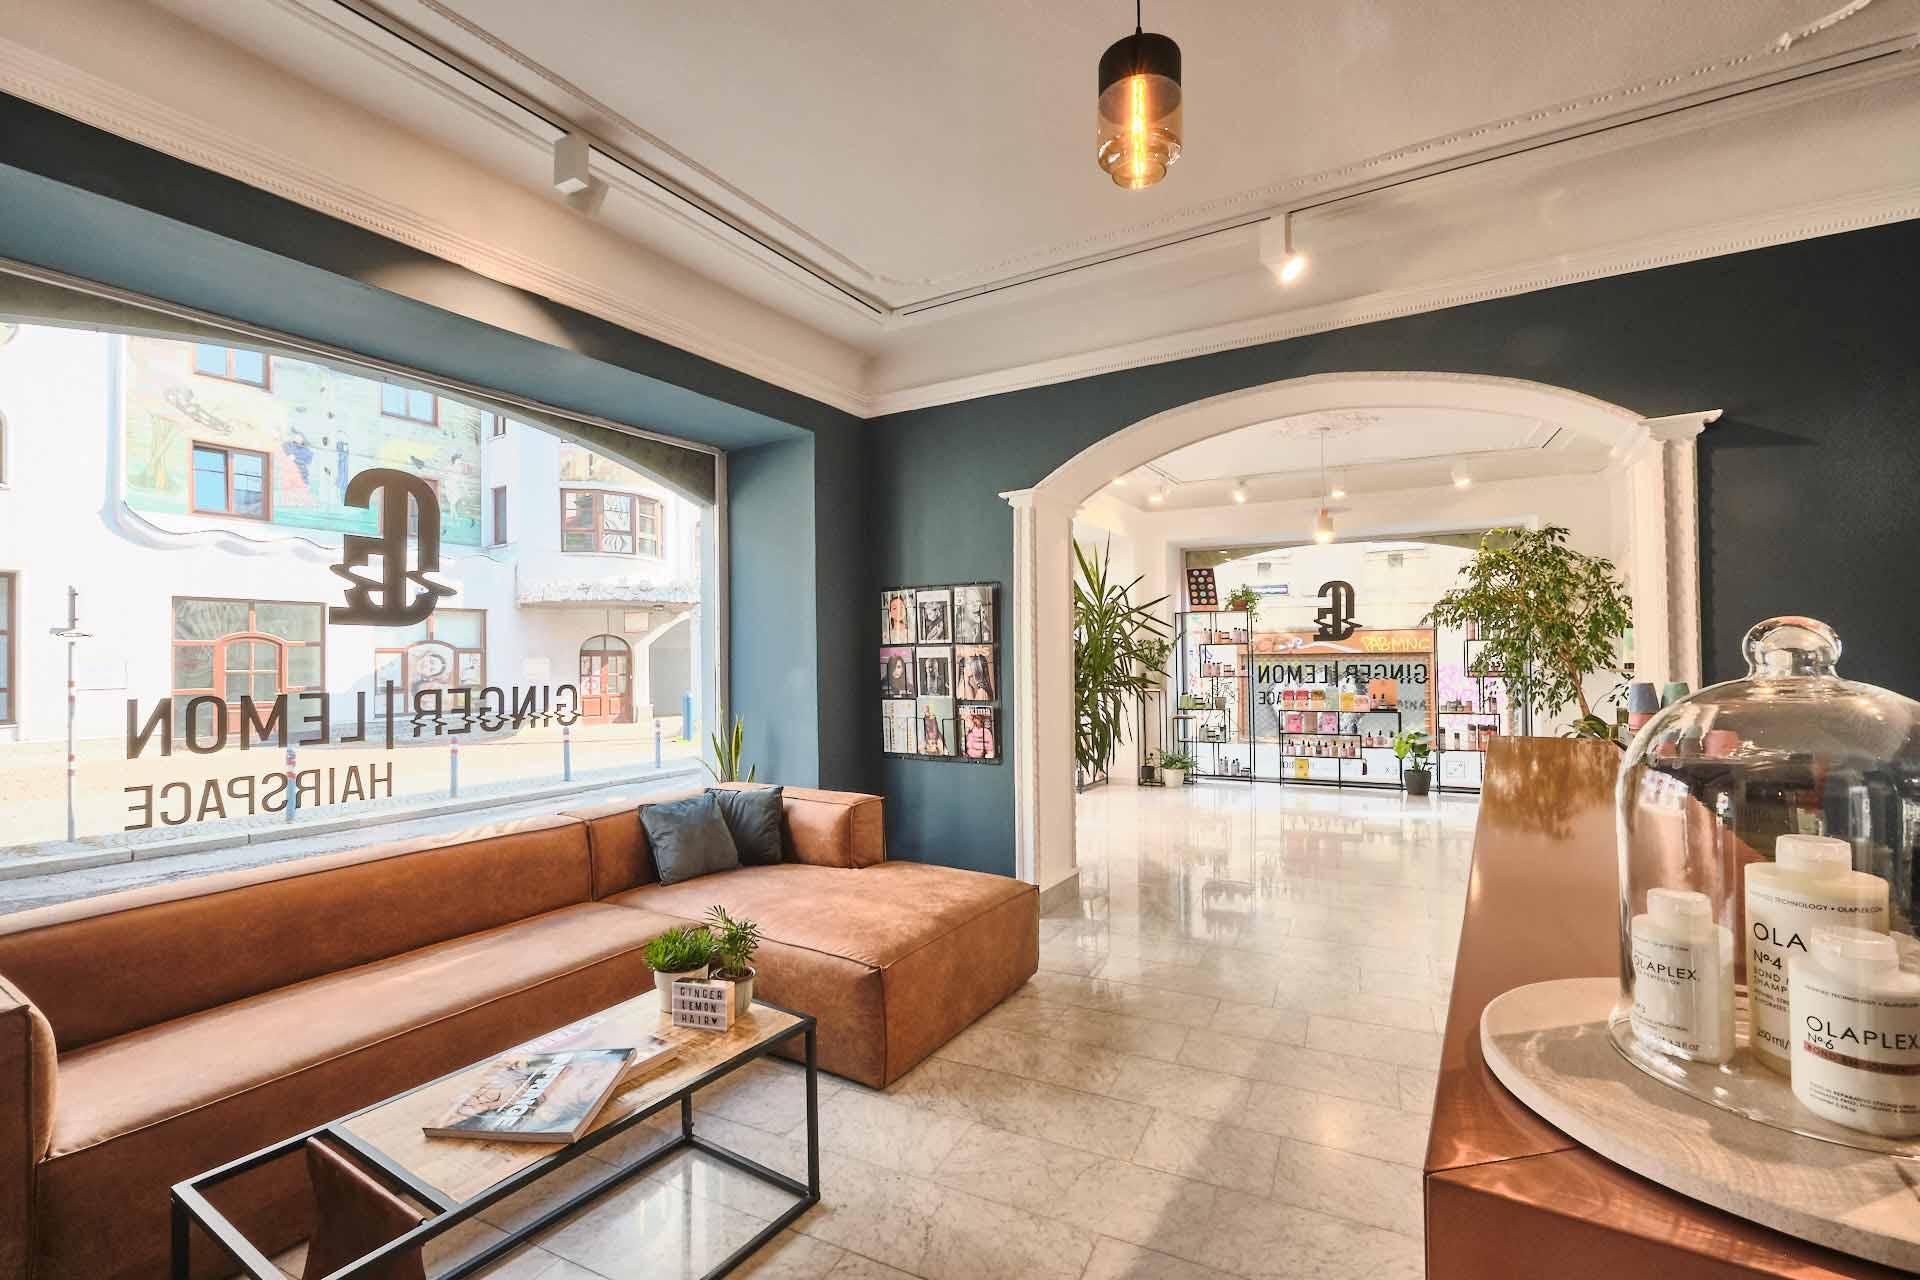 interior+design+luxurs+highclass+nobel+top+salon+friseur+lounge+gingerlemon+hairspace+wien+1060+gumpendorferstrasse+friseur.jpg